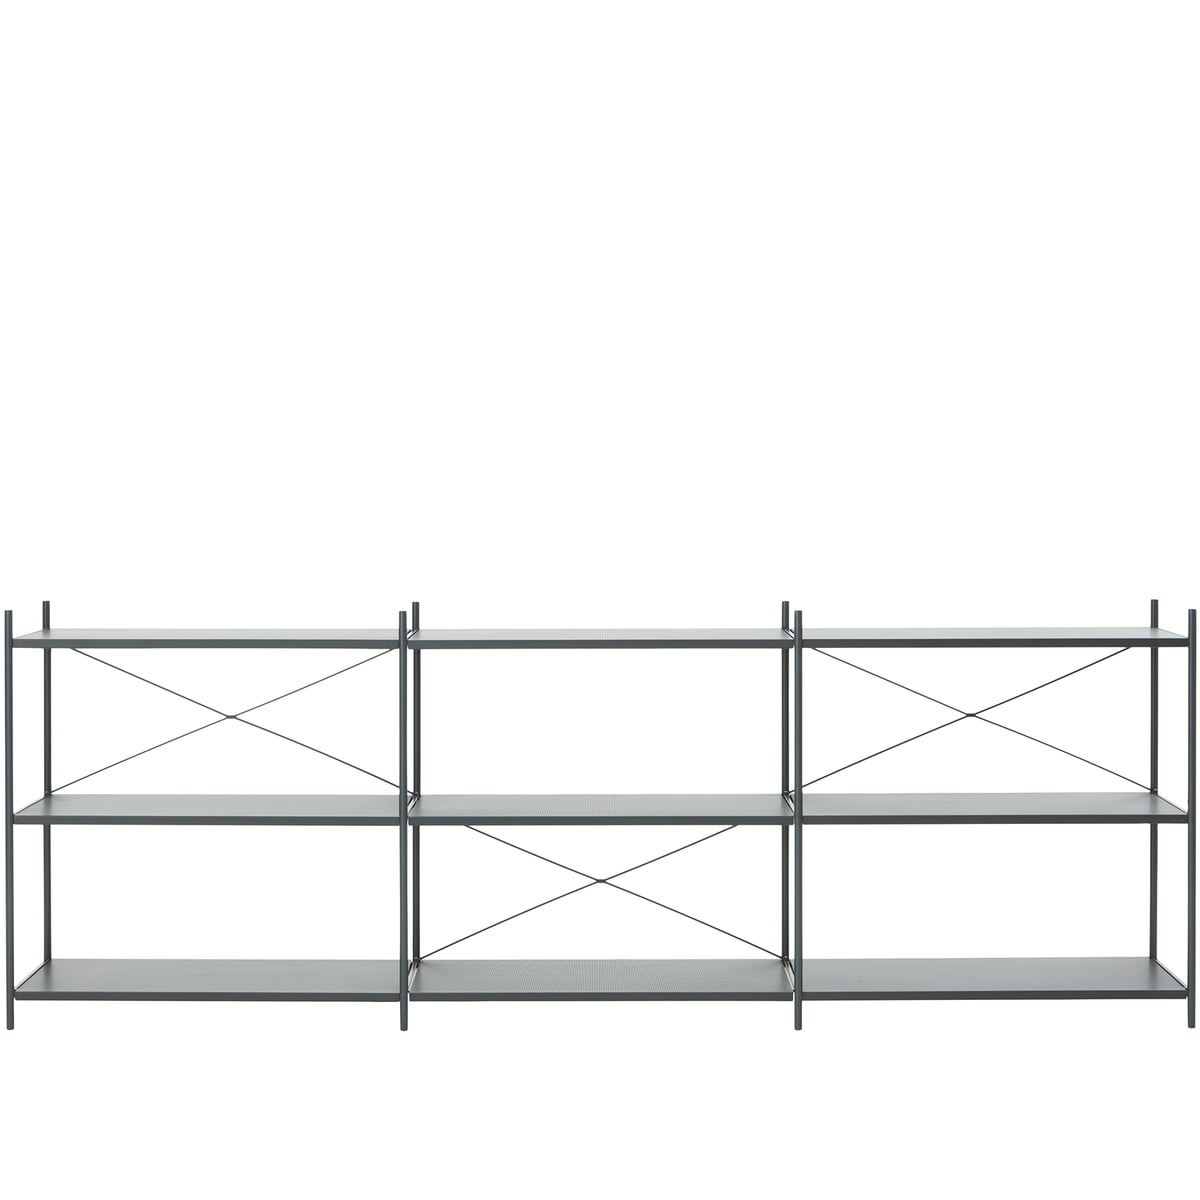 ferm Living - Punctual Regalsystem 3x3, dunkelblau | Wohnzimmer > Regale | Dunkelblau | Metall pulverbeschichtet | ferm living